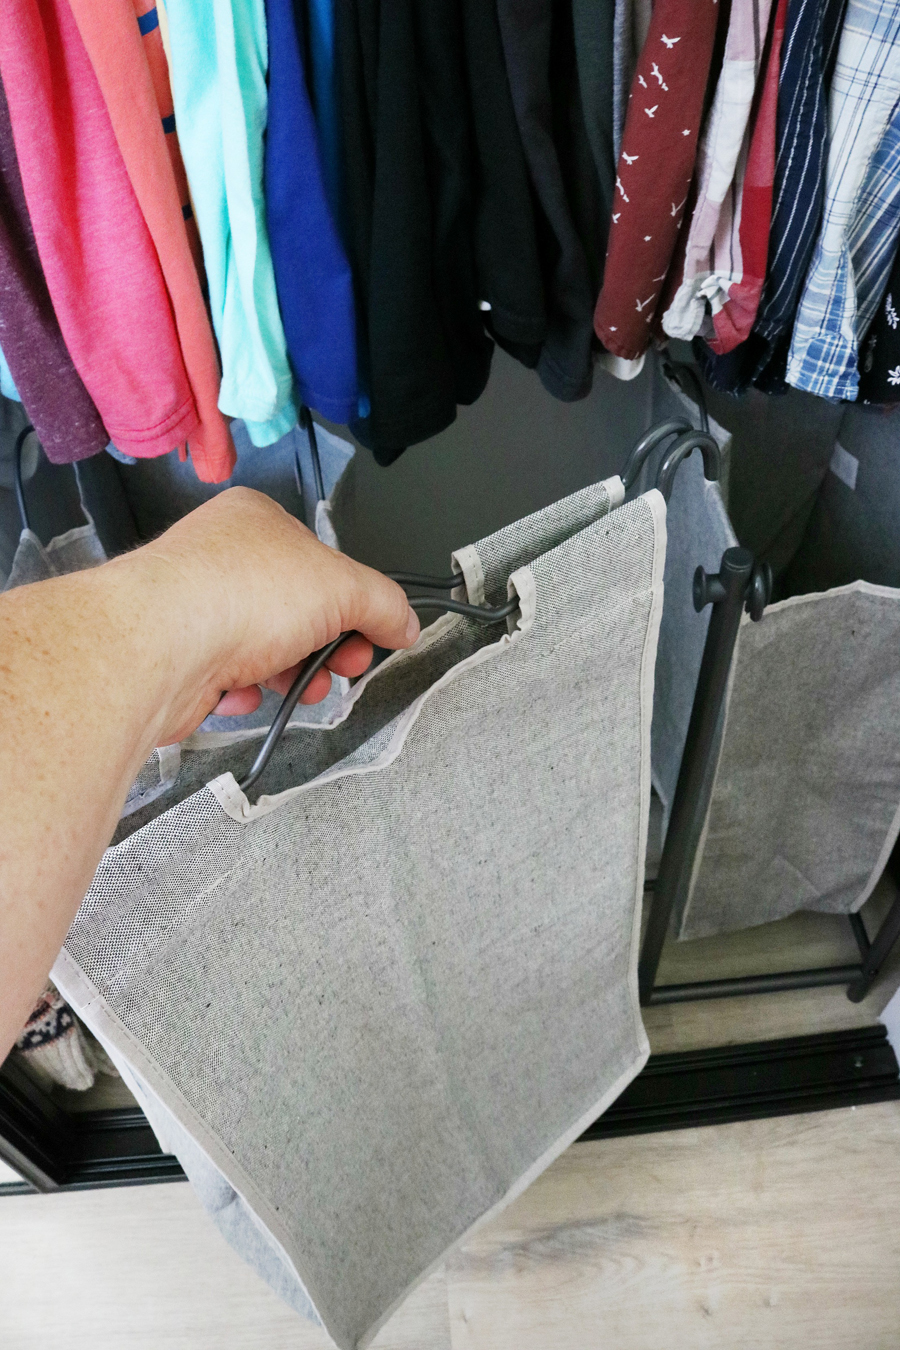 Easy Organization Idea - Removable laundry bag sorter